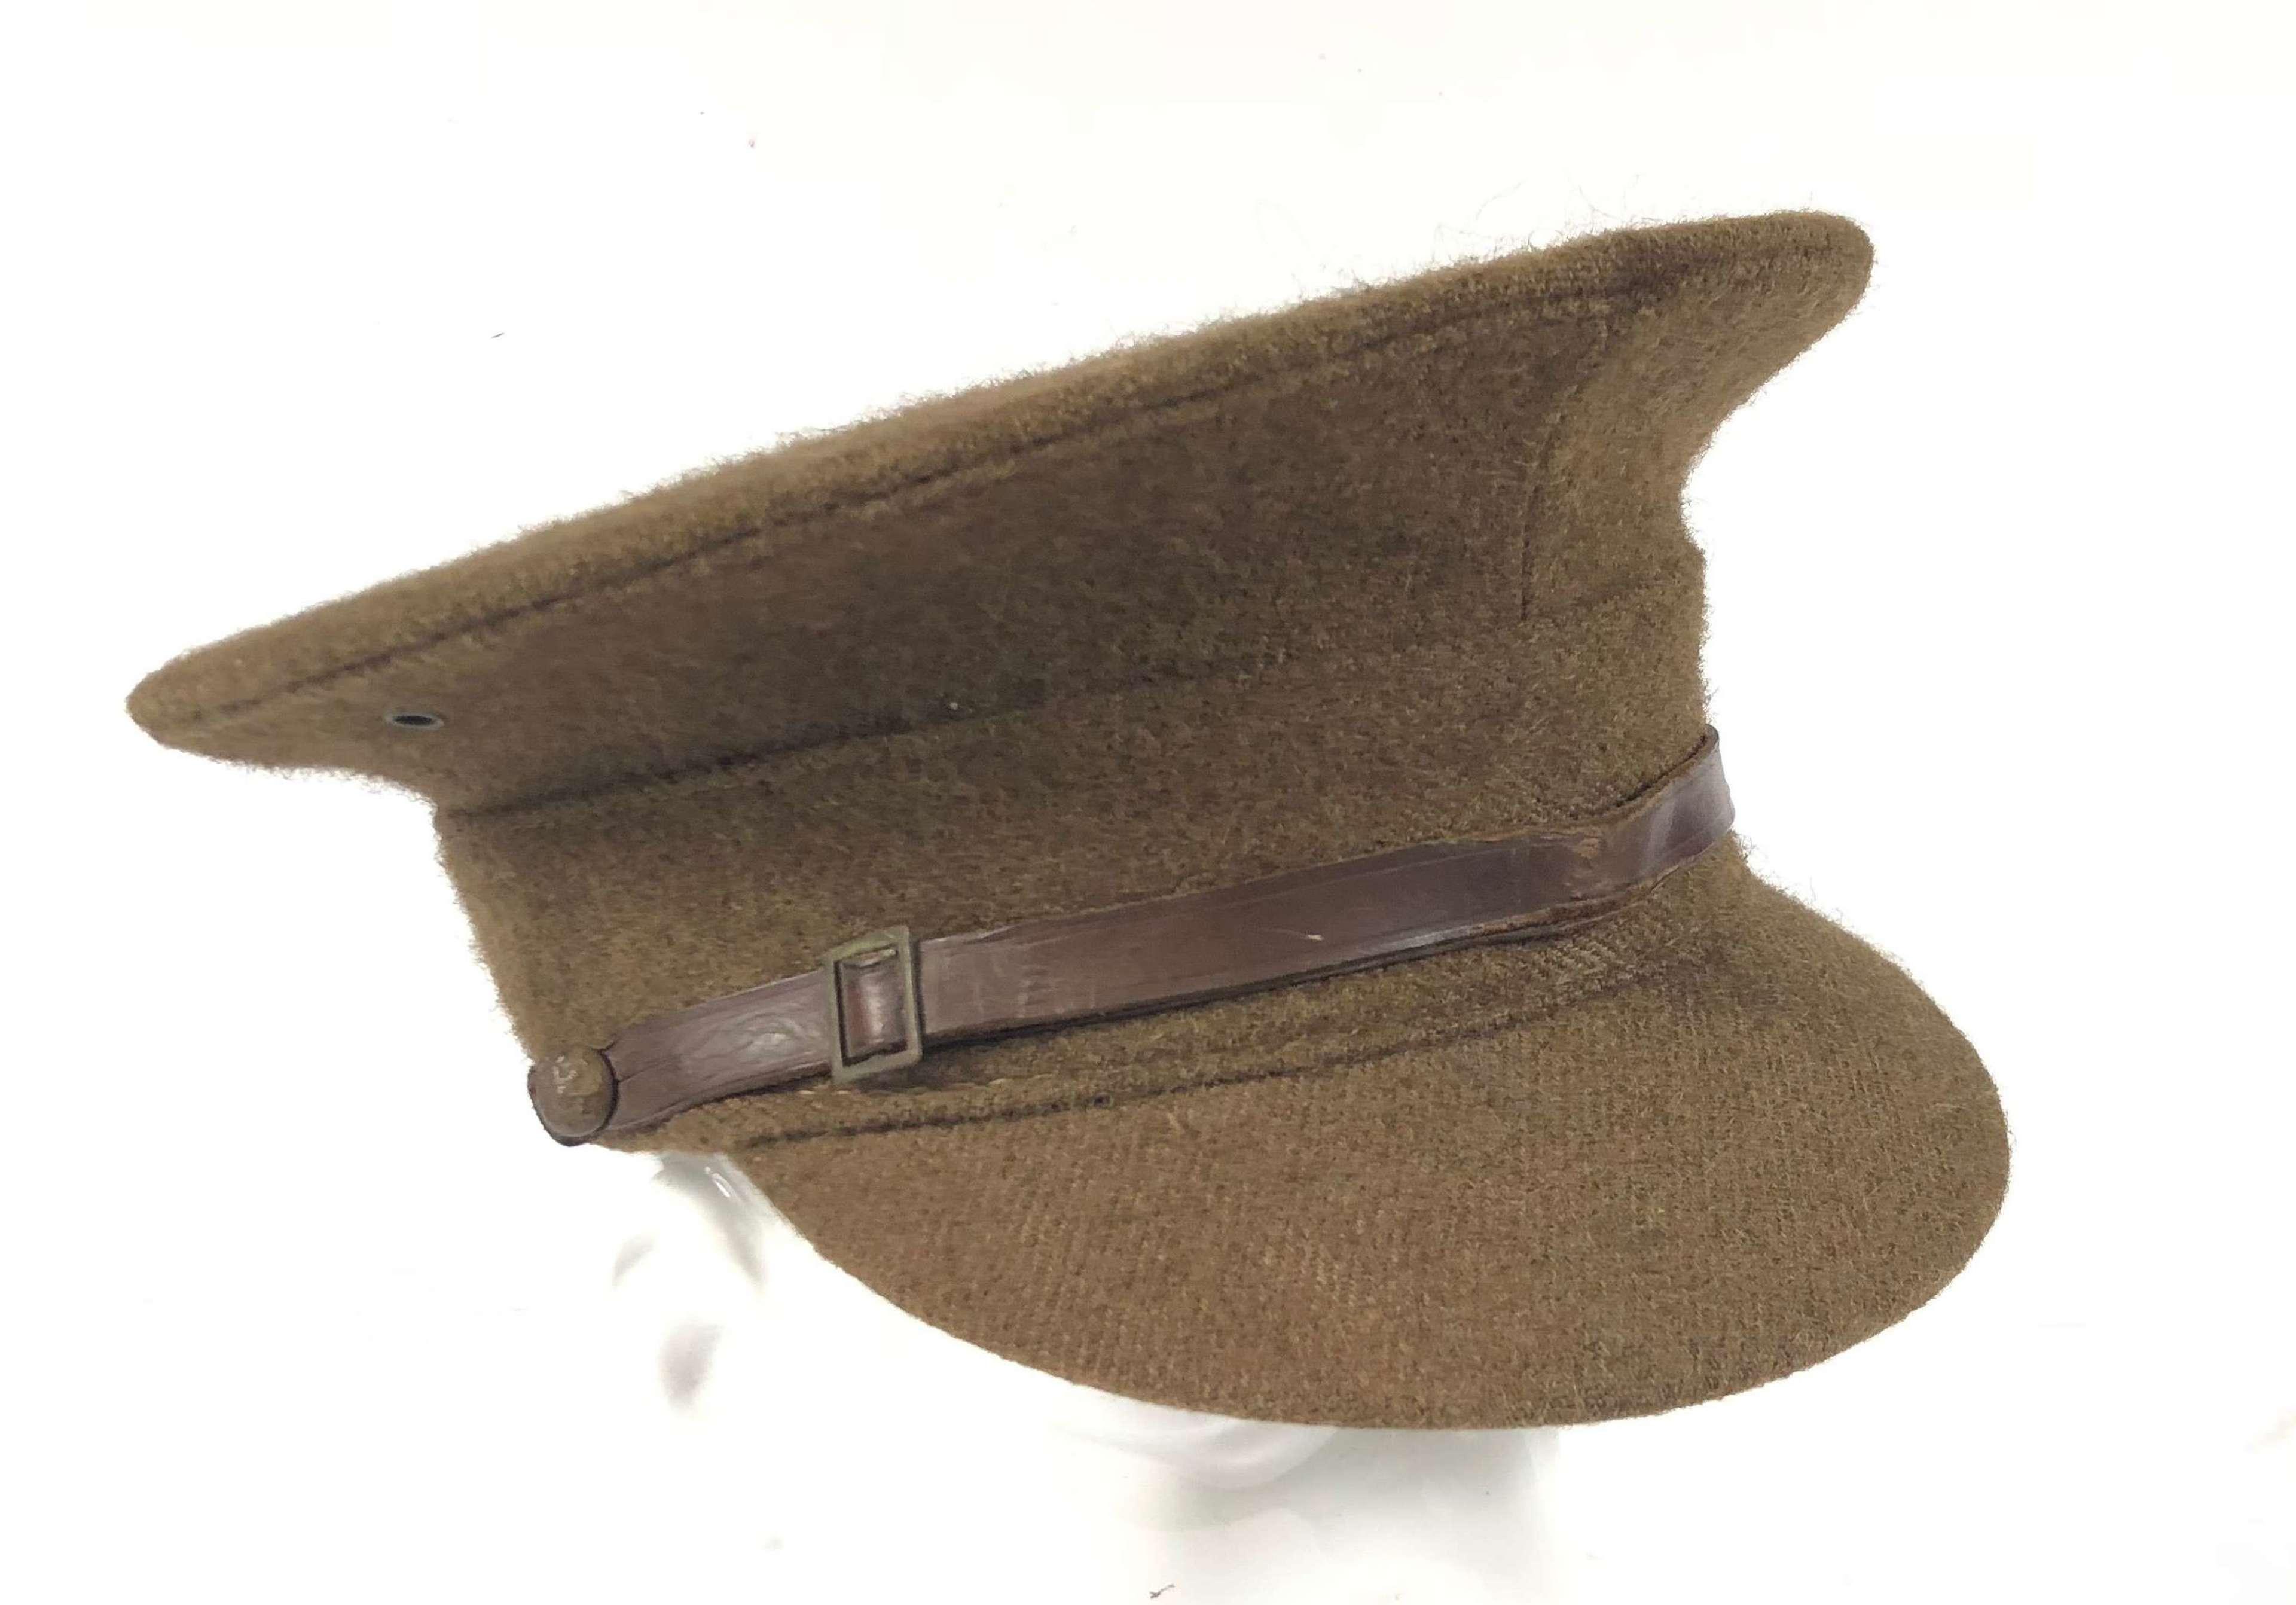 British Army Interwar Issue of the 1922 Pattern Service Cap.